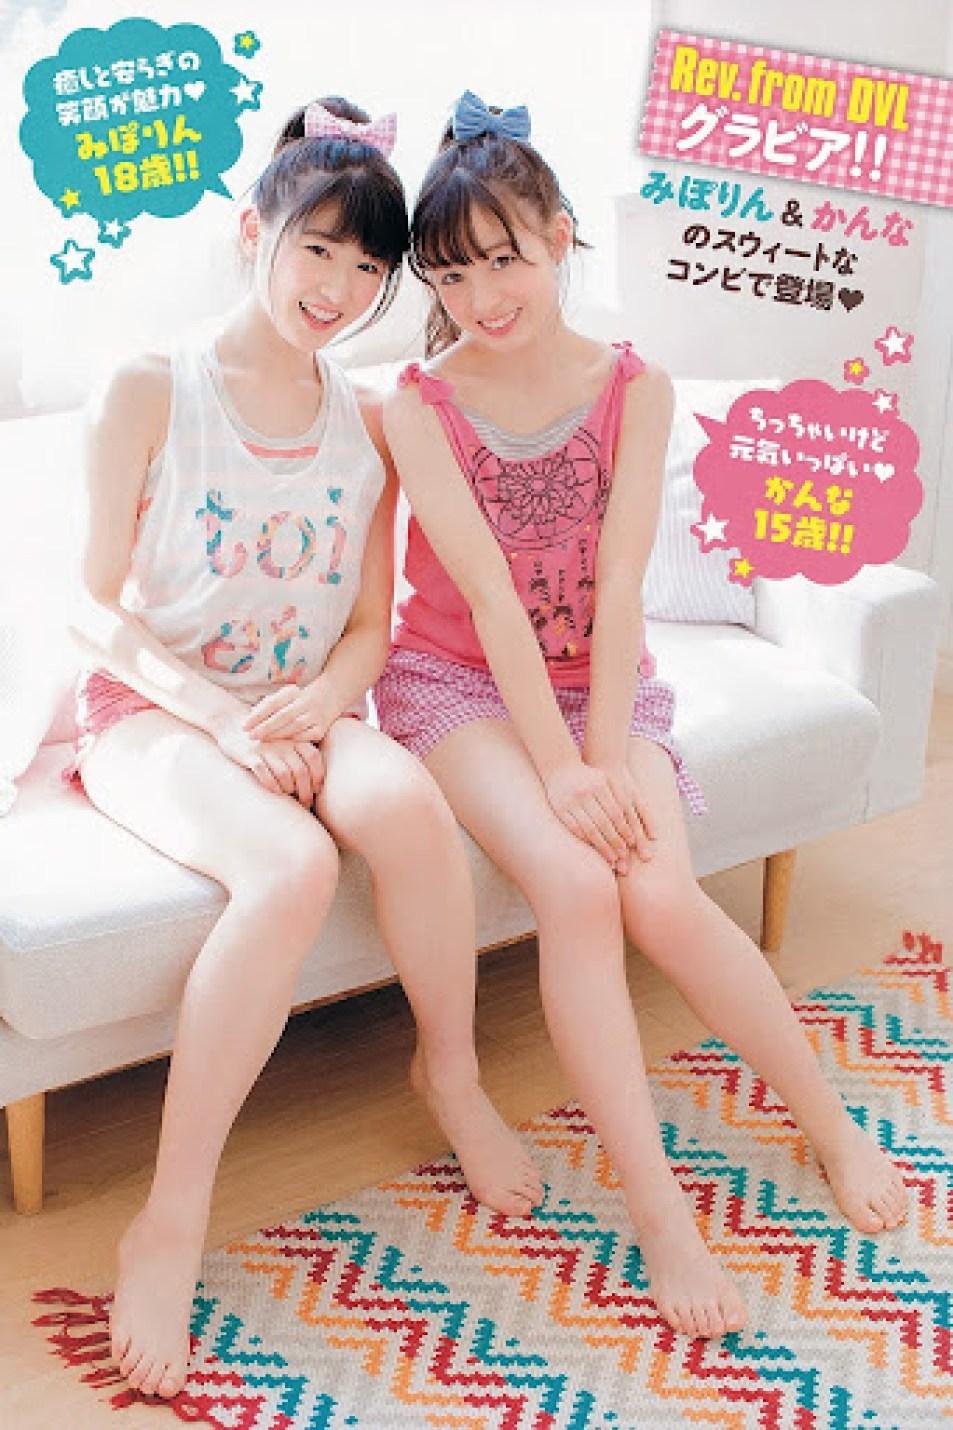 15330_hashimoto-kanna_magazine_young champion